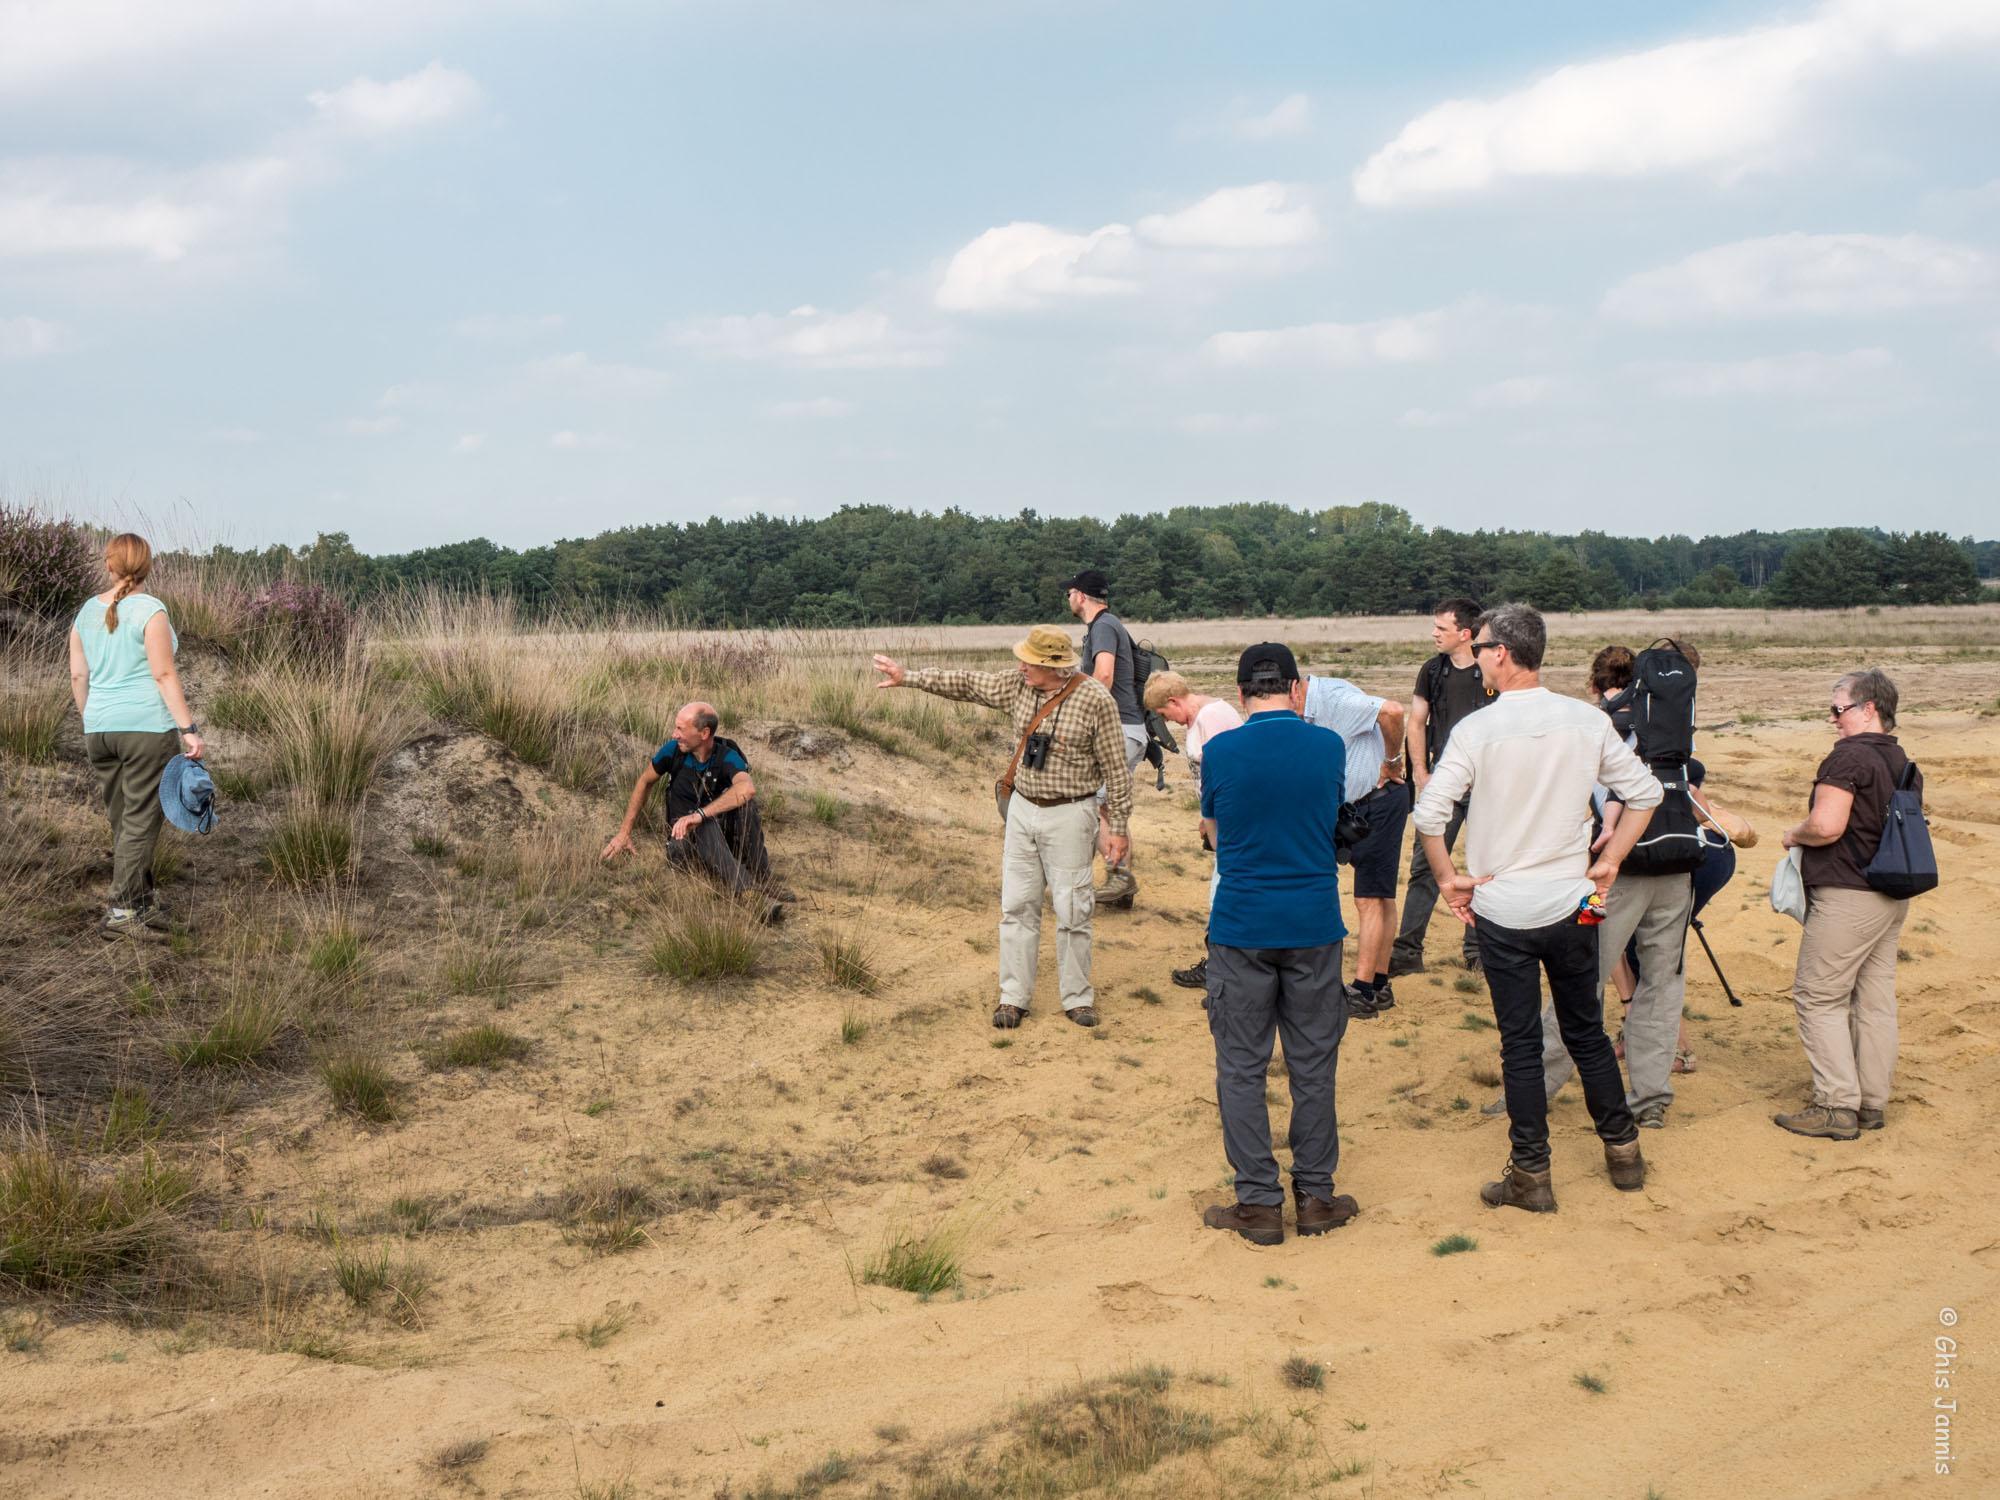 Heidewandeling , militair domein Hechtel , 27 augustus 2017 - foto 2